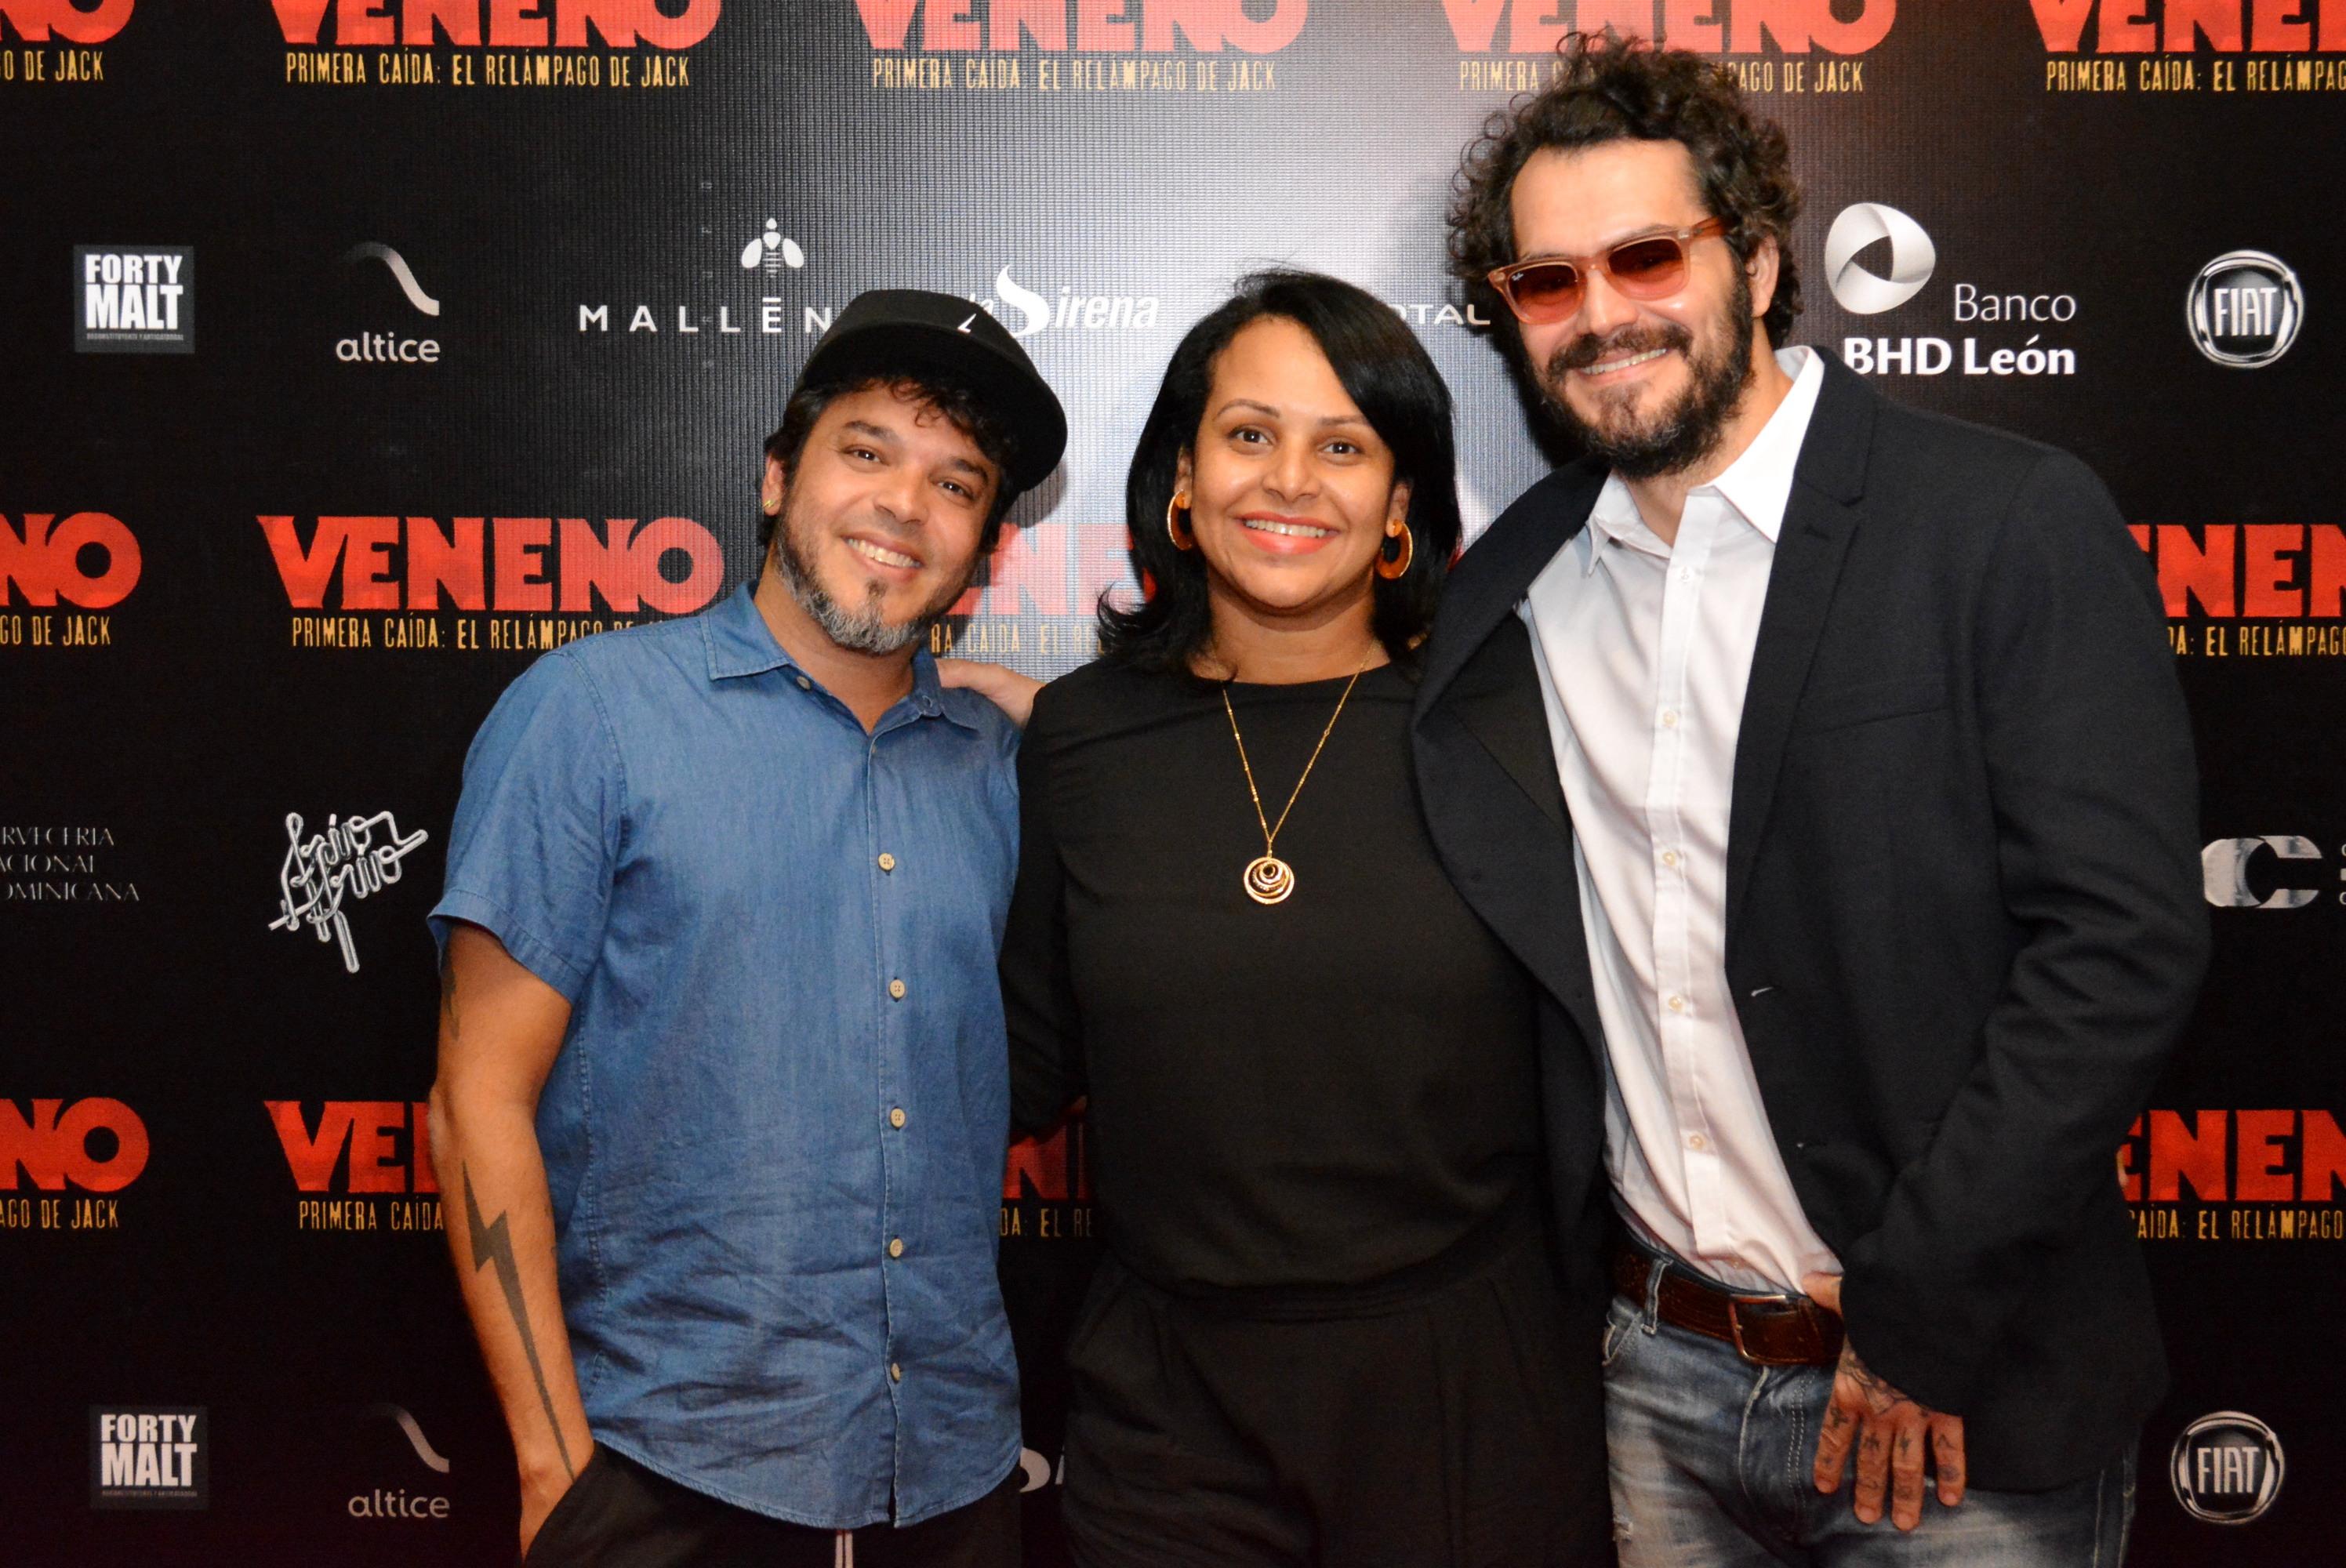 Tabare Blanchard, Zumaya Cordero, Riccardo Bardelino